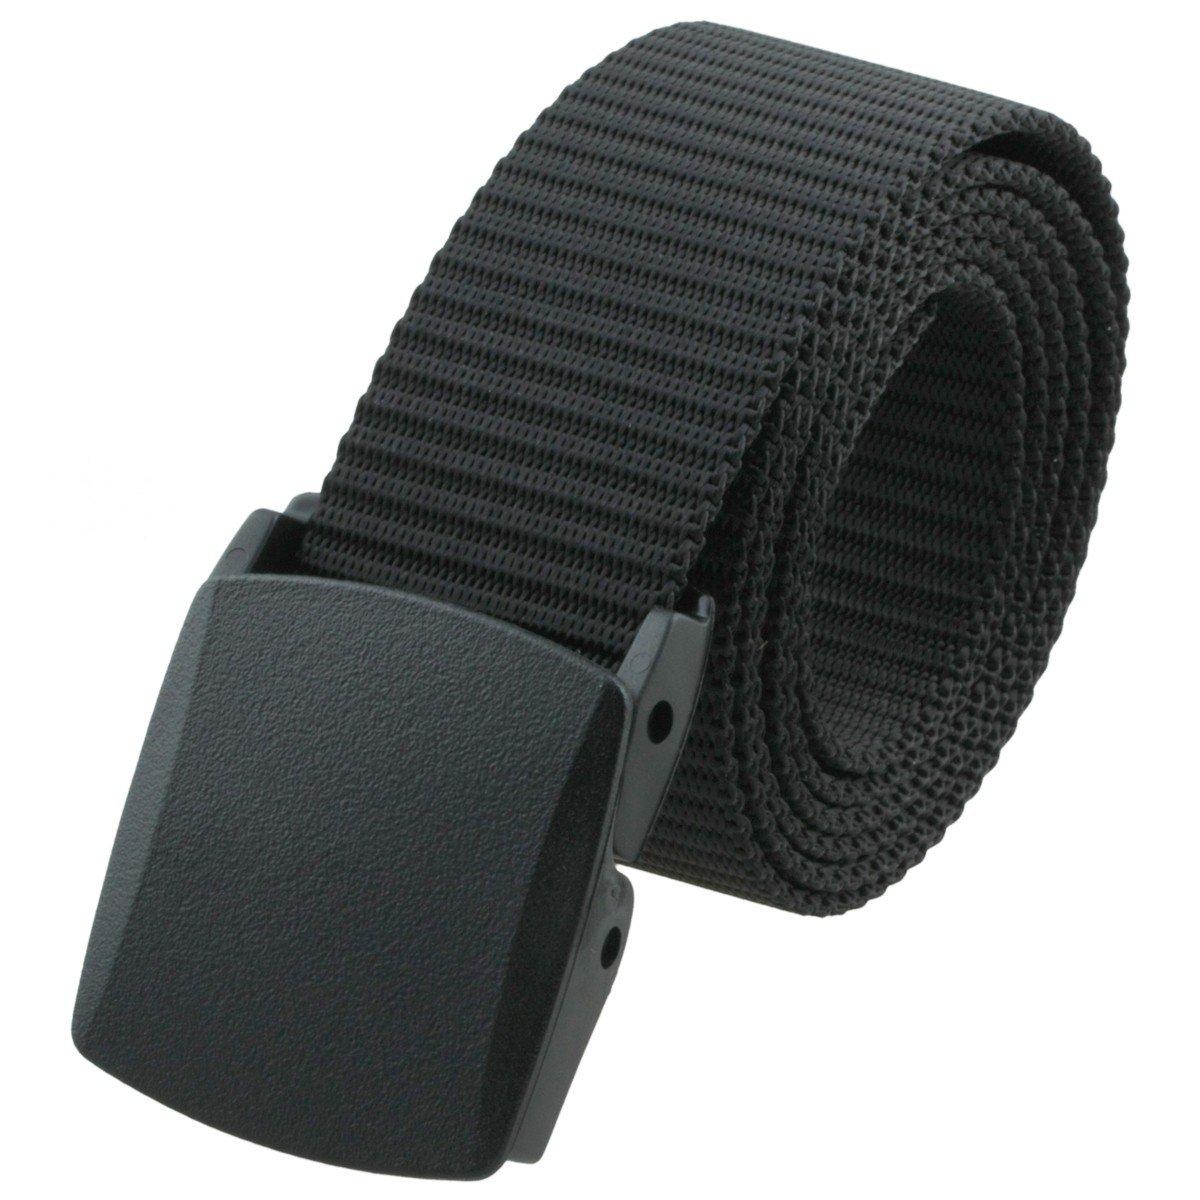 ddc0ce98ba Top 10 wholesale Adjustable Nylon Belt - Chinabrands.com